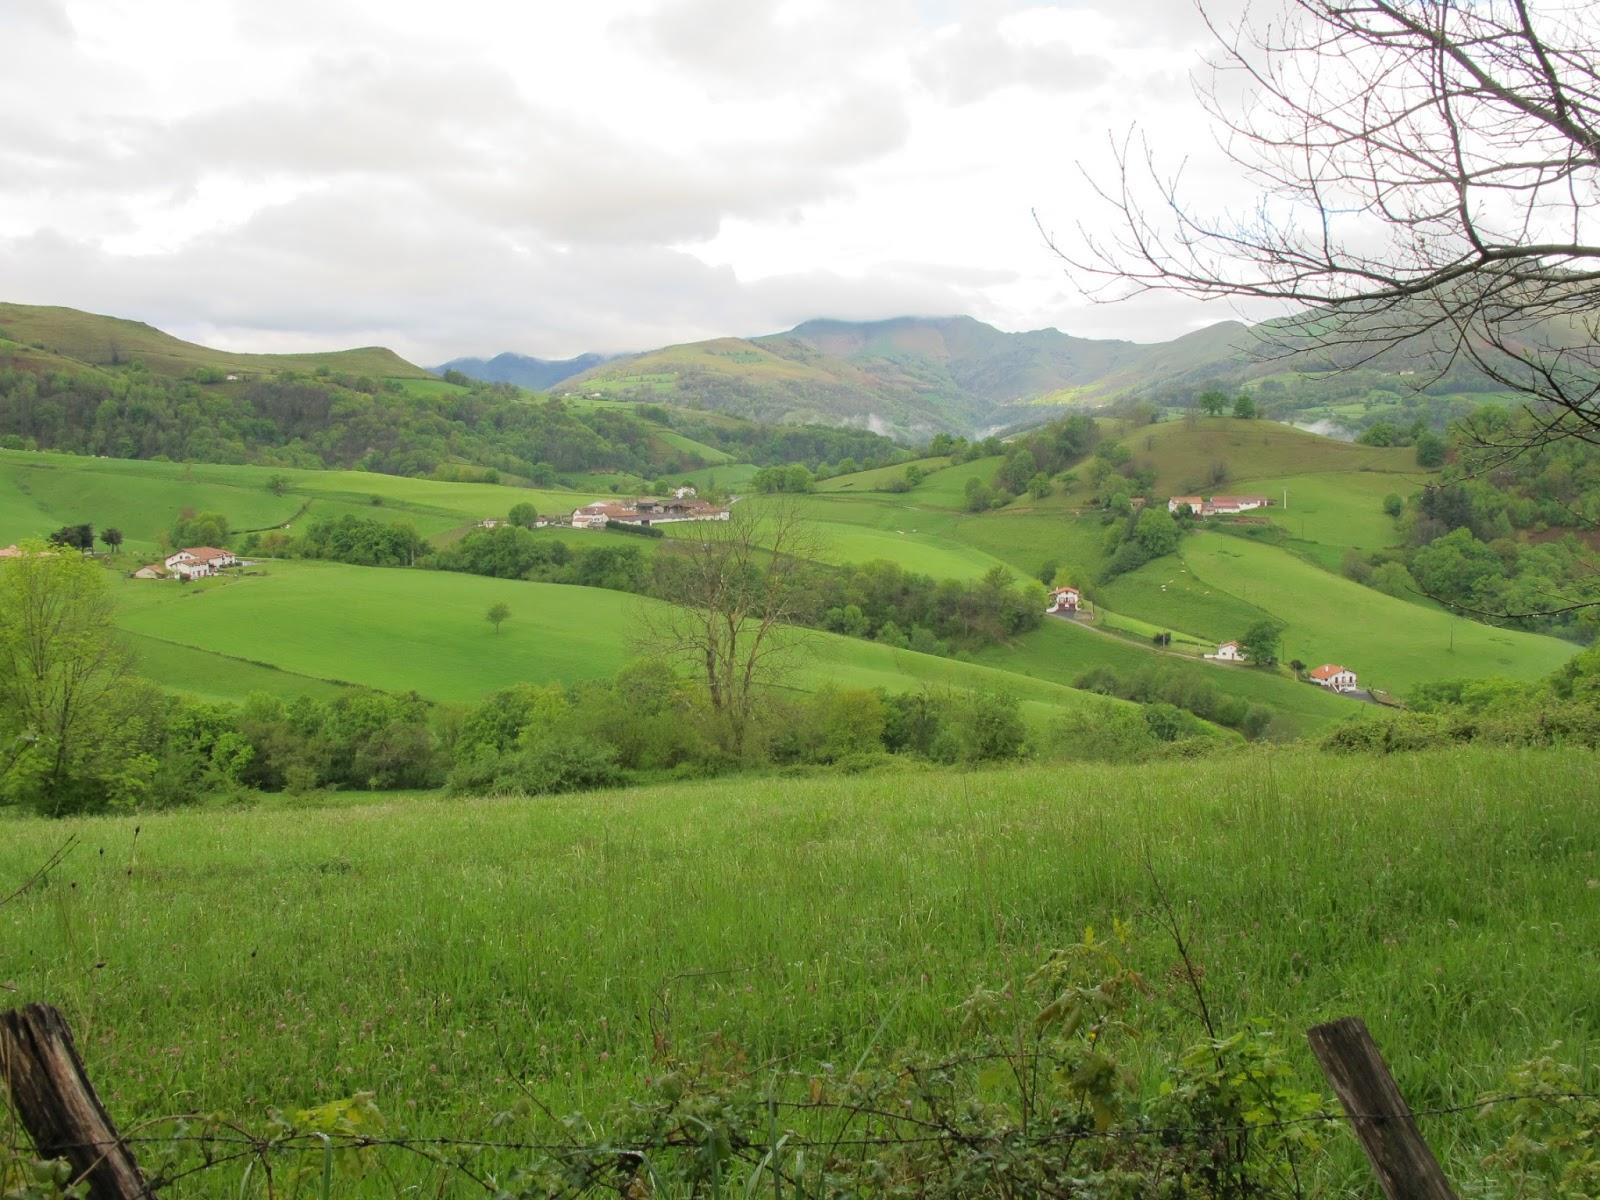 Camino de Santiago Le Puy to Finisterre spring 2013 Saint Jean